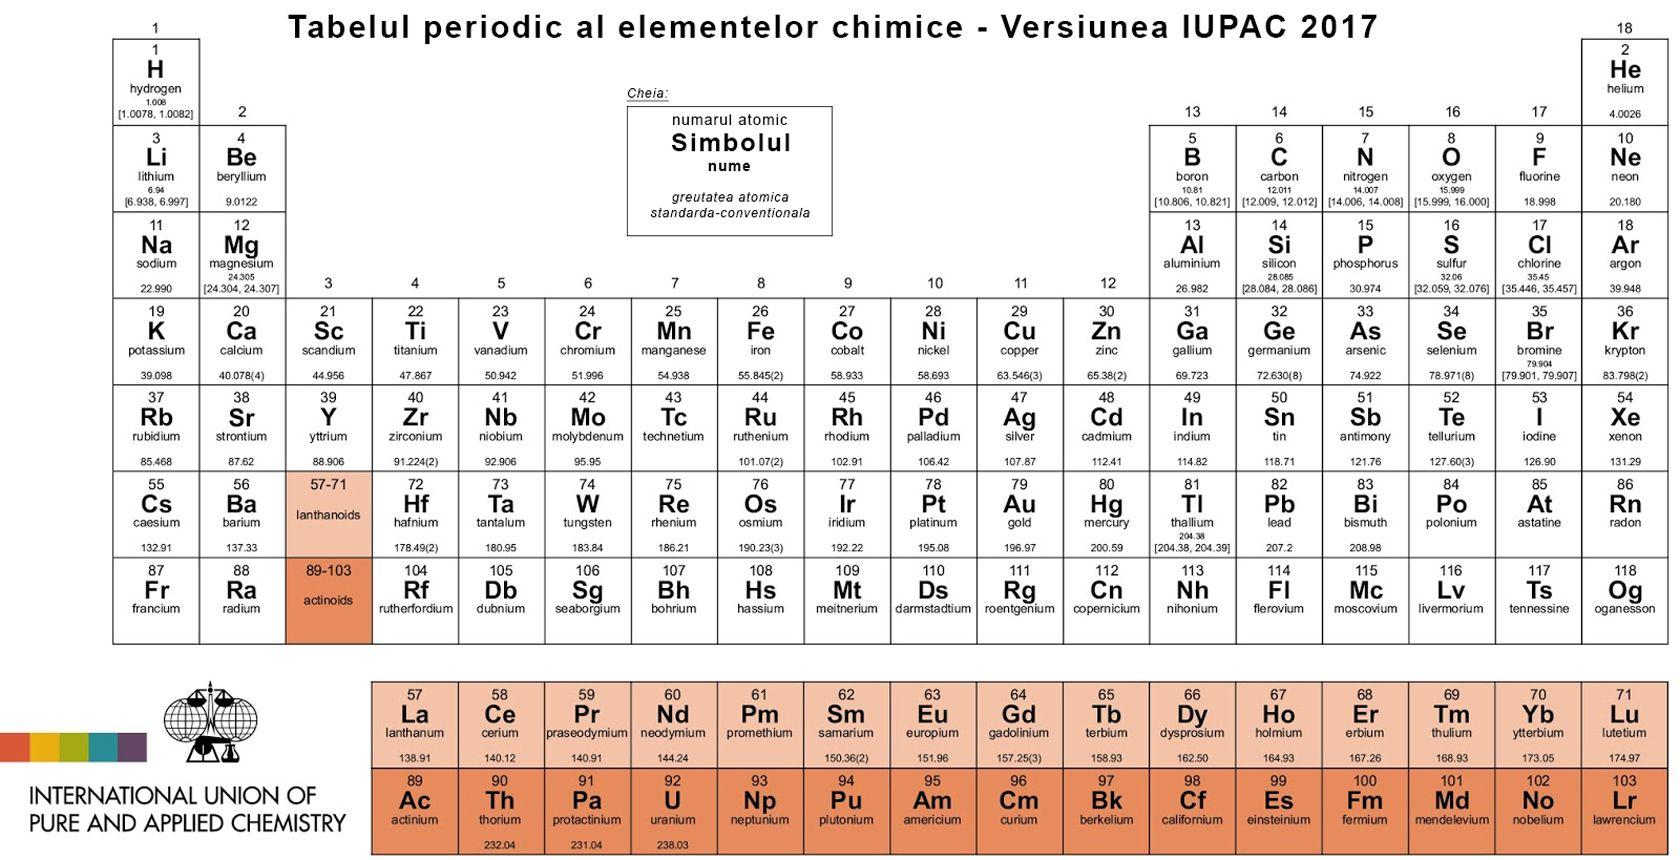 Tabelul lui mendeleev versiunea iupac 2017